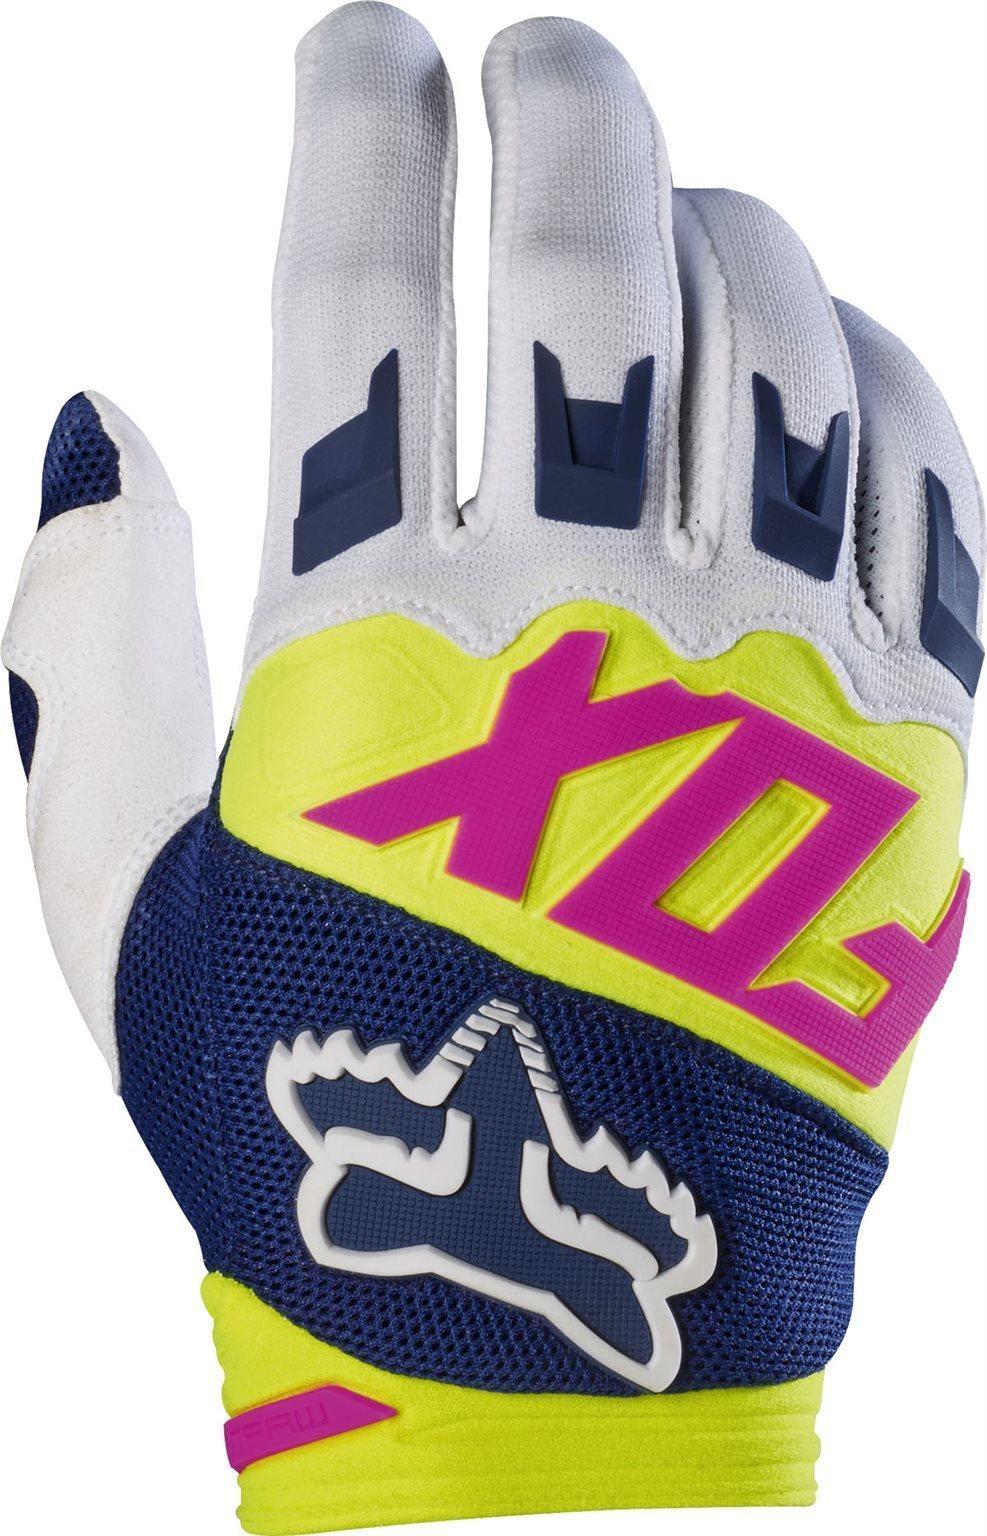 Fox cross kesztyû Dirtpaw Race MX17.